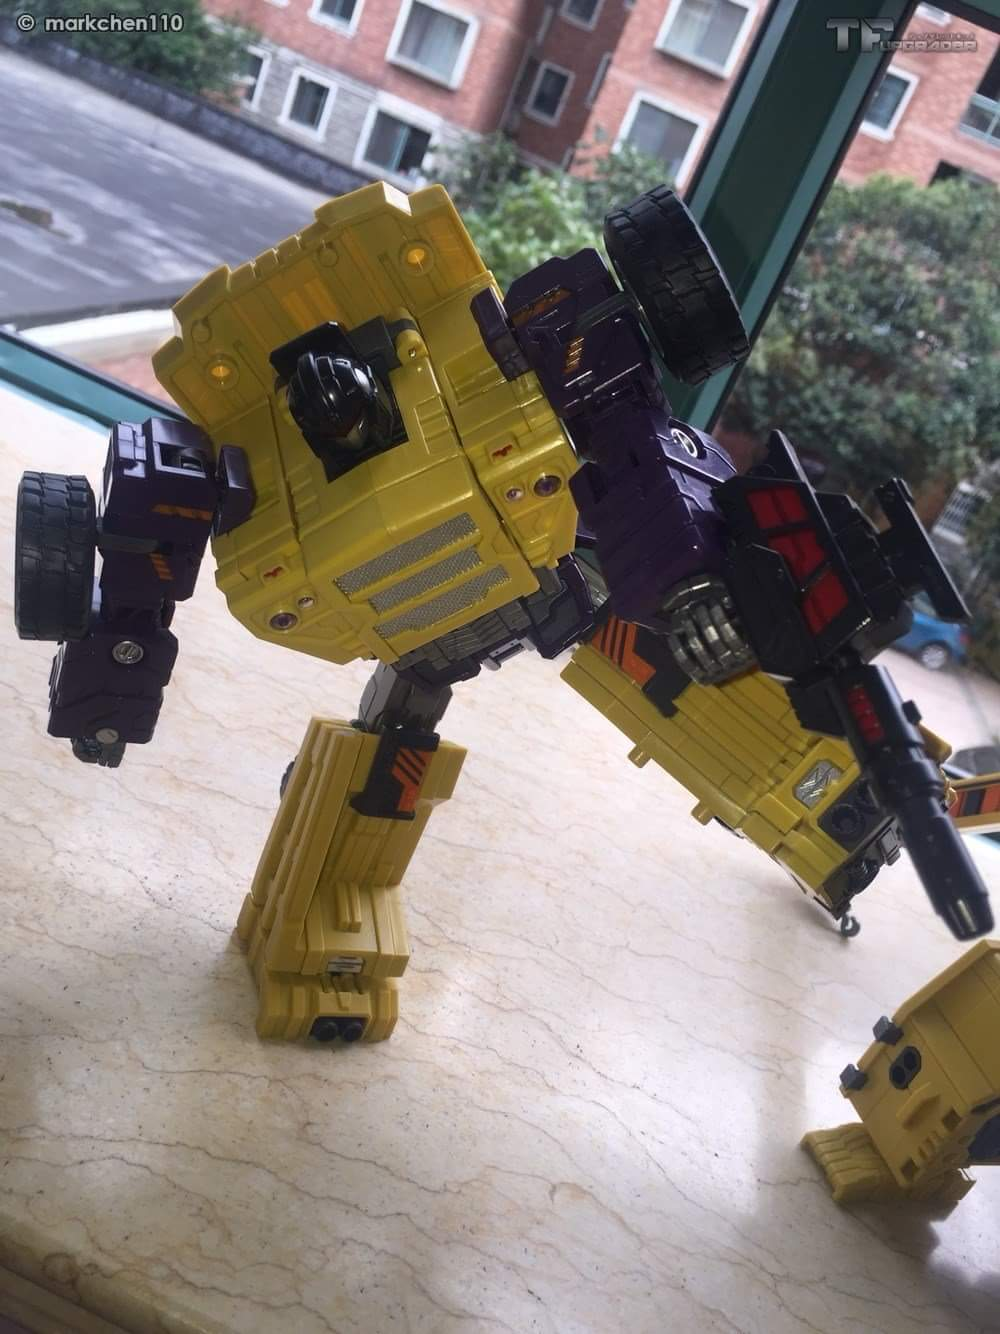 [Toyworld] Produit Tiers - Jouet TW-C Constructor aka Devastator/Dévastateur (Version vert G1 et jaune G2) - Page 8 7ldkgvTp